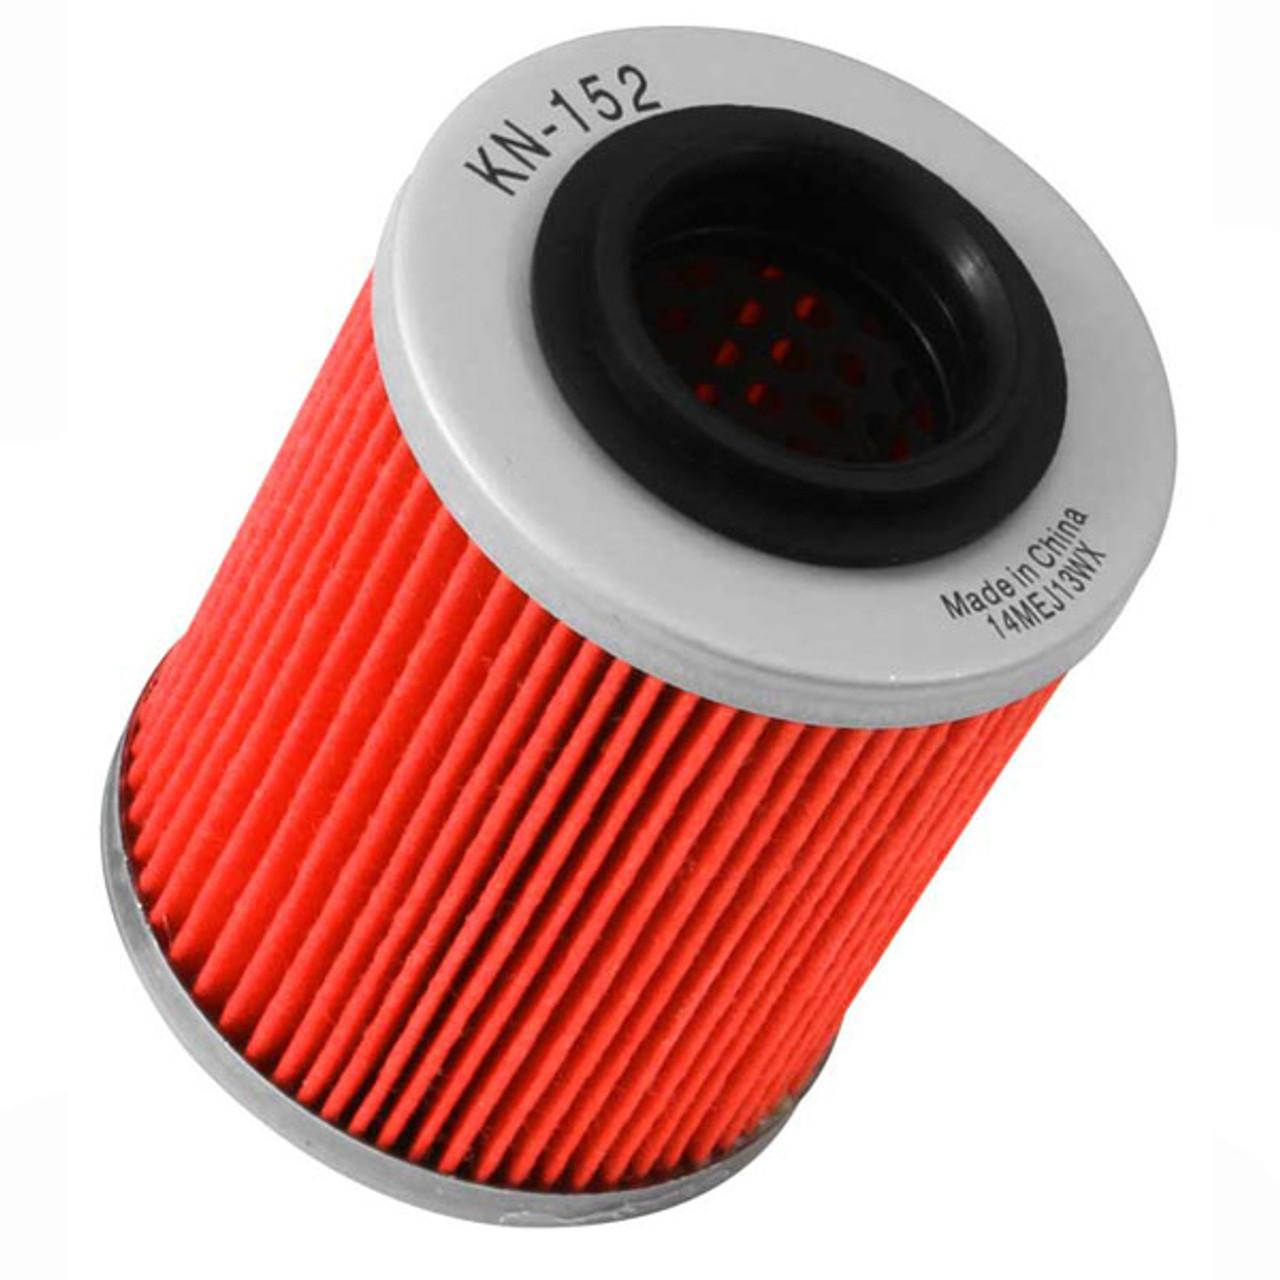 K/&N Performance Oil Filter For Aprilia 2006 RSV 1000 Tuono Racing